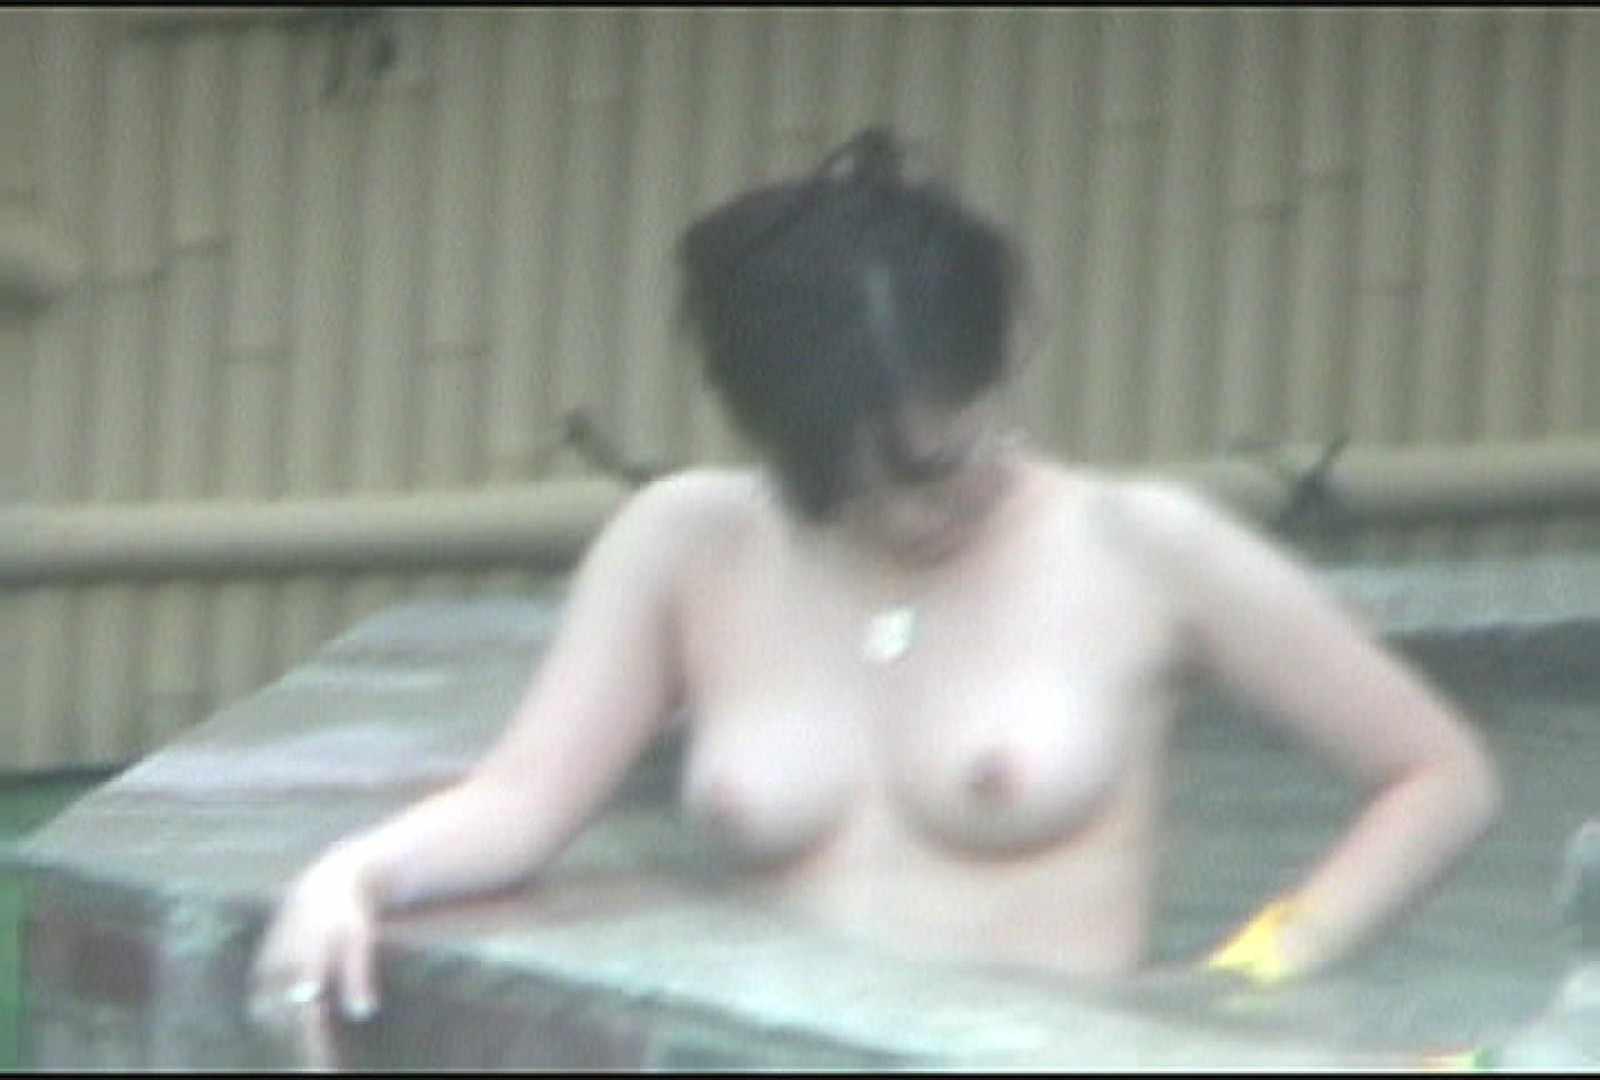 Aquaな露天風呂Vol.145 露天 おまんこ動画流出 106画像 89